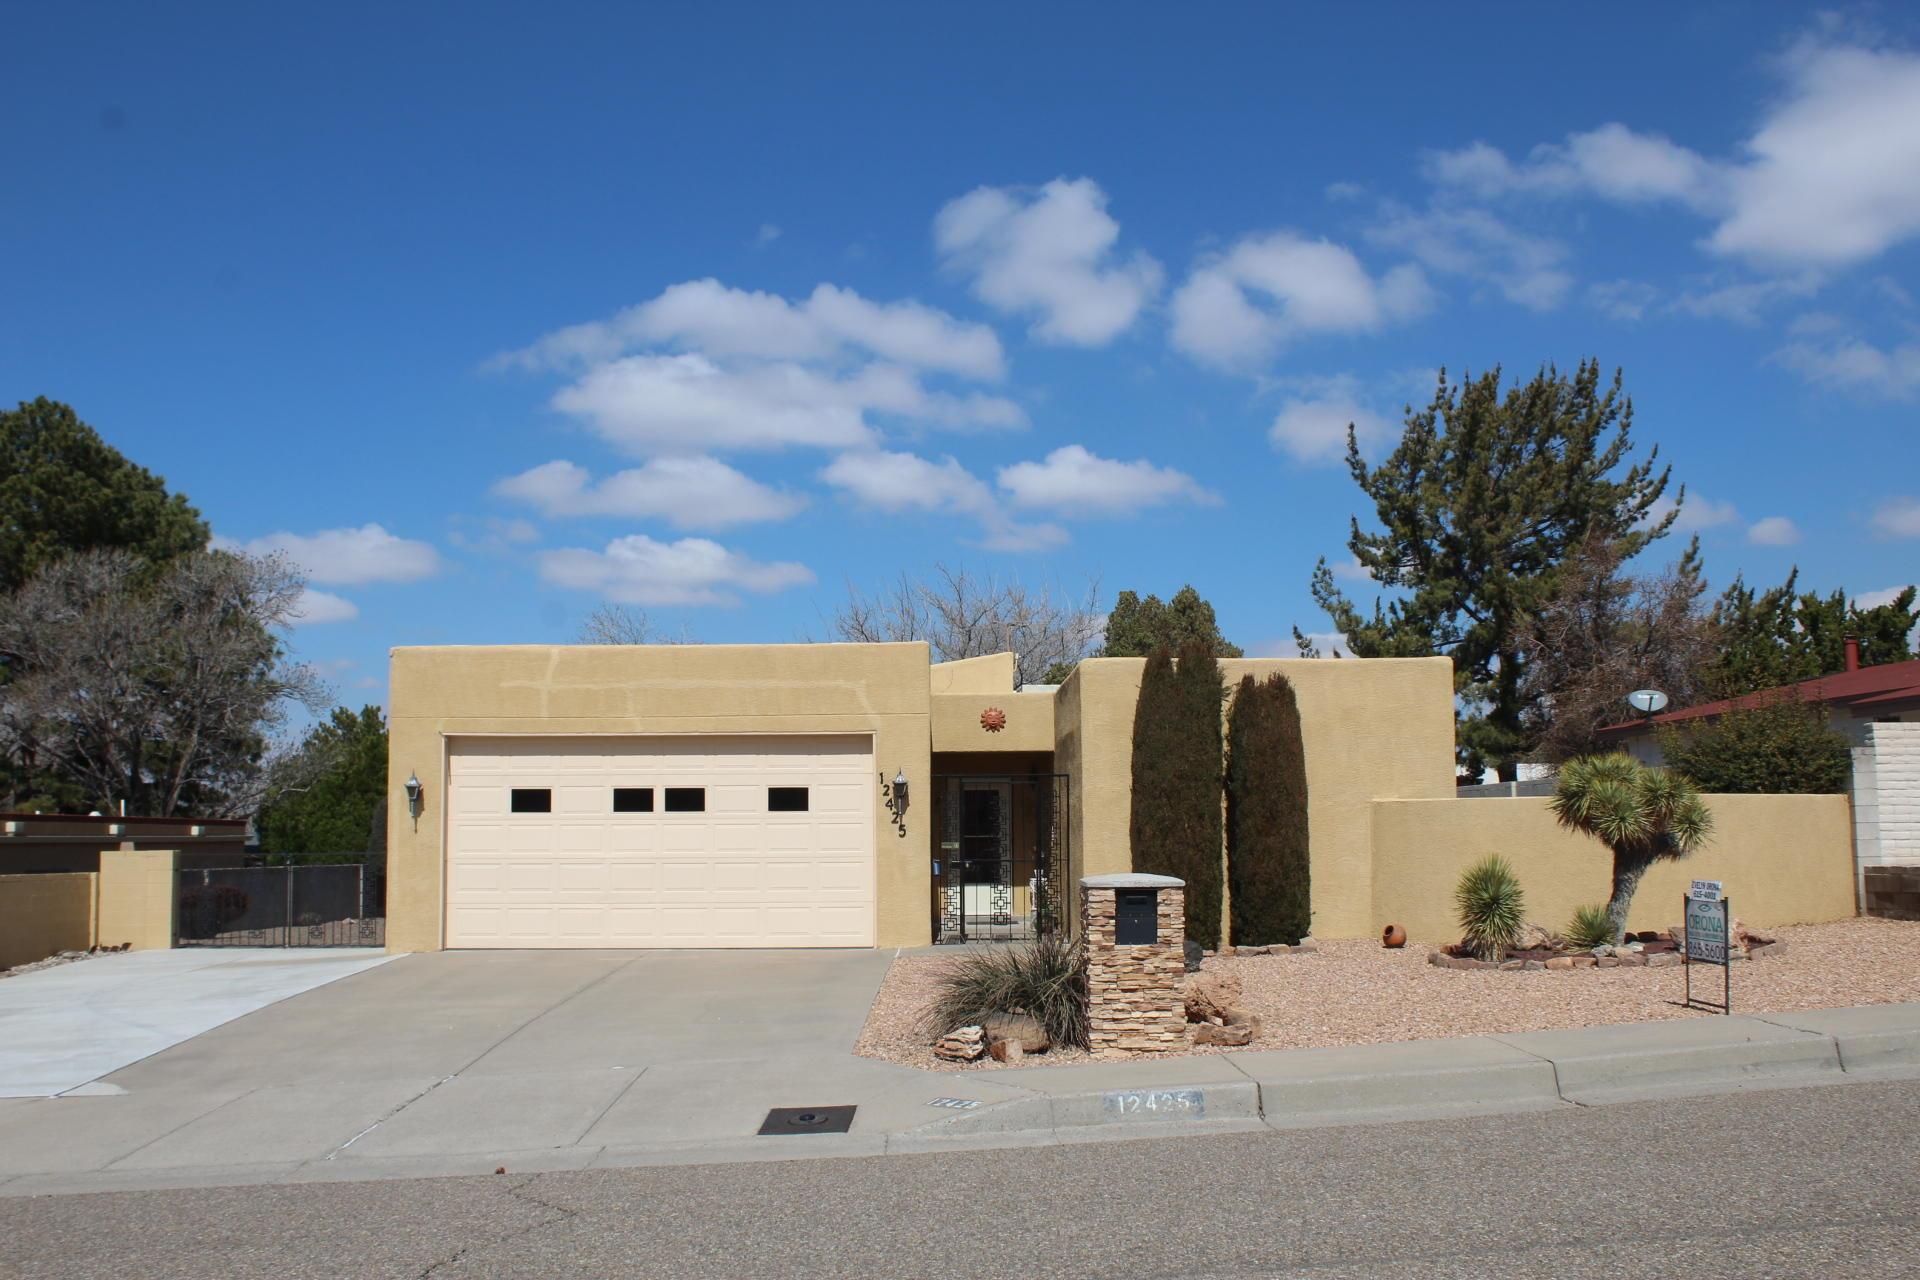 12425 NE Princess Jeanne Avenue, Albuquerque Northeast Heights, New Mexico